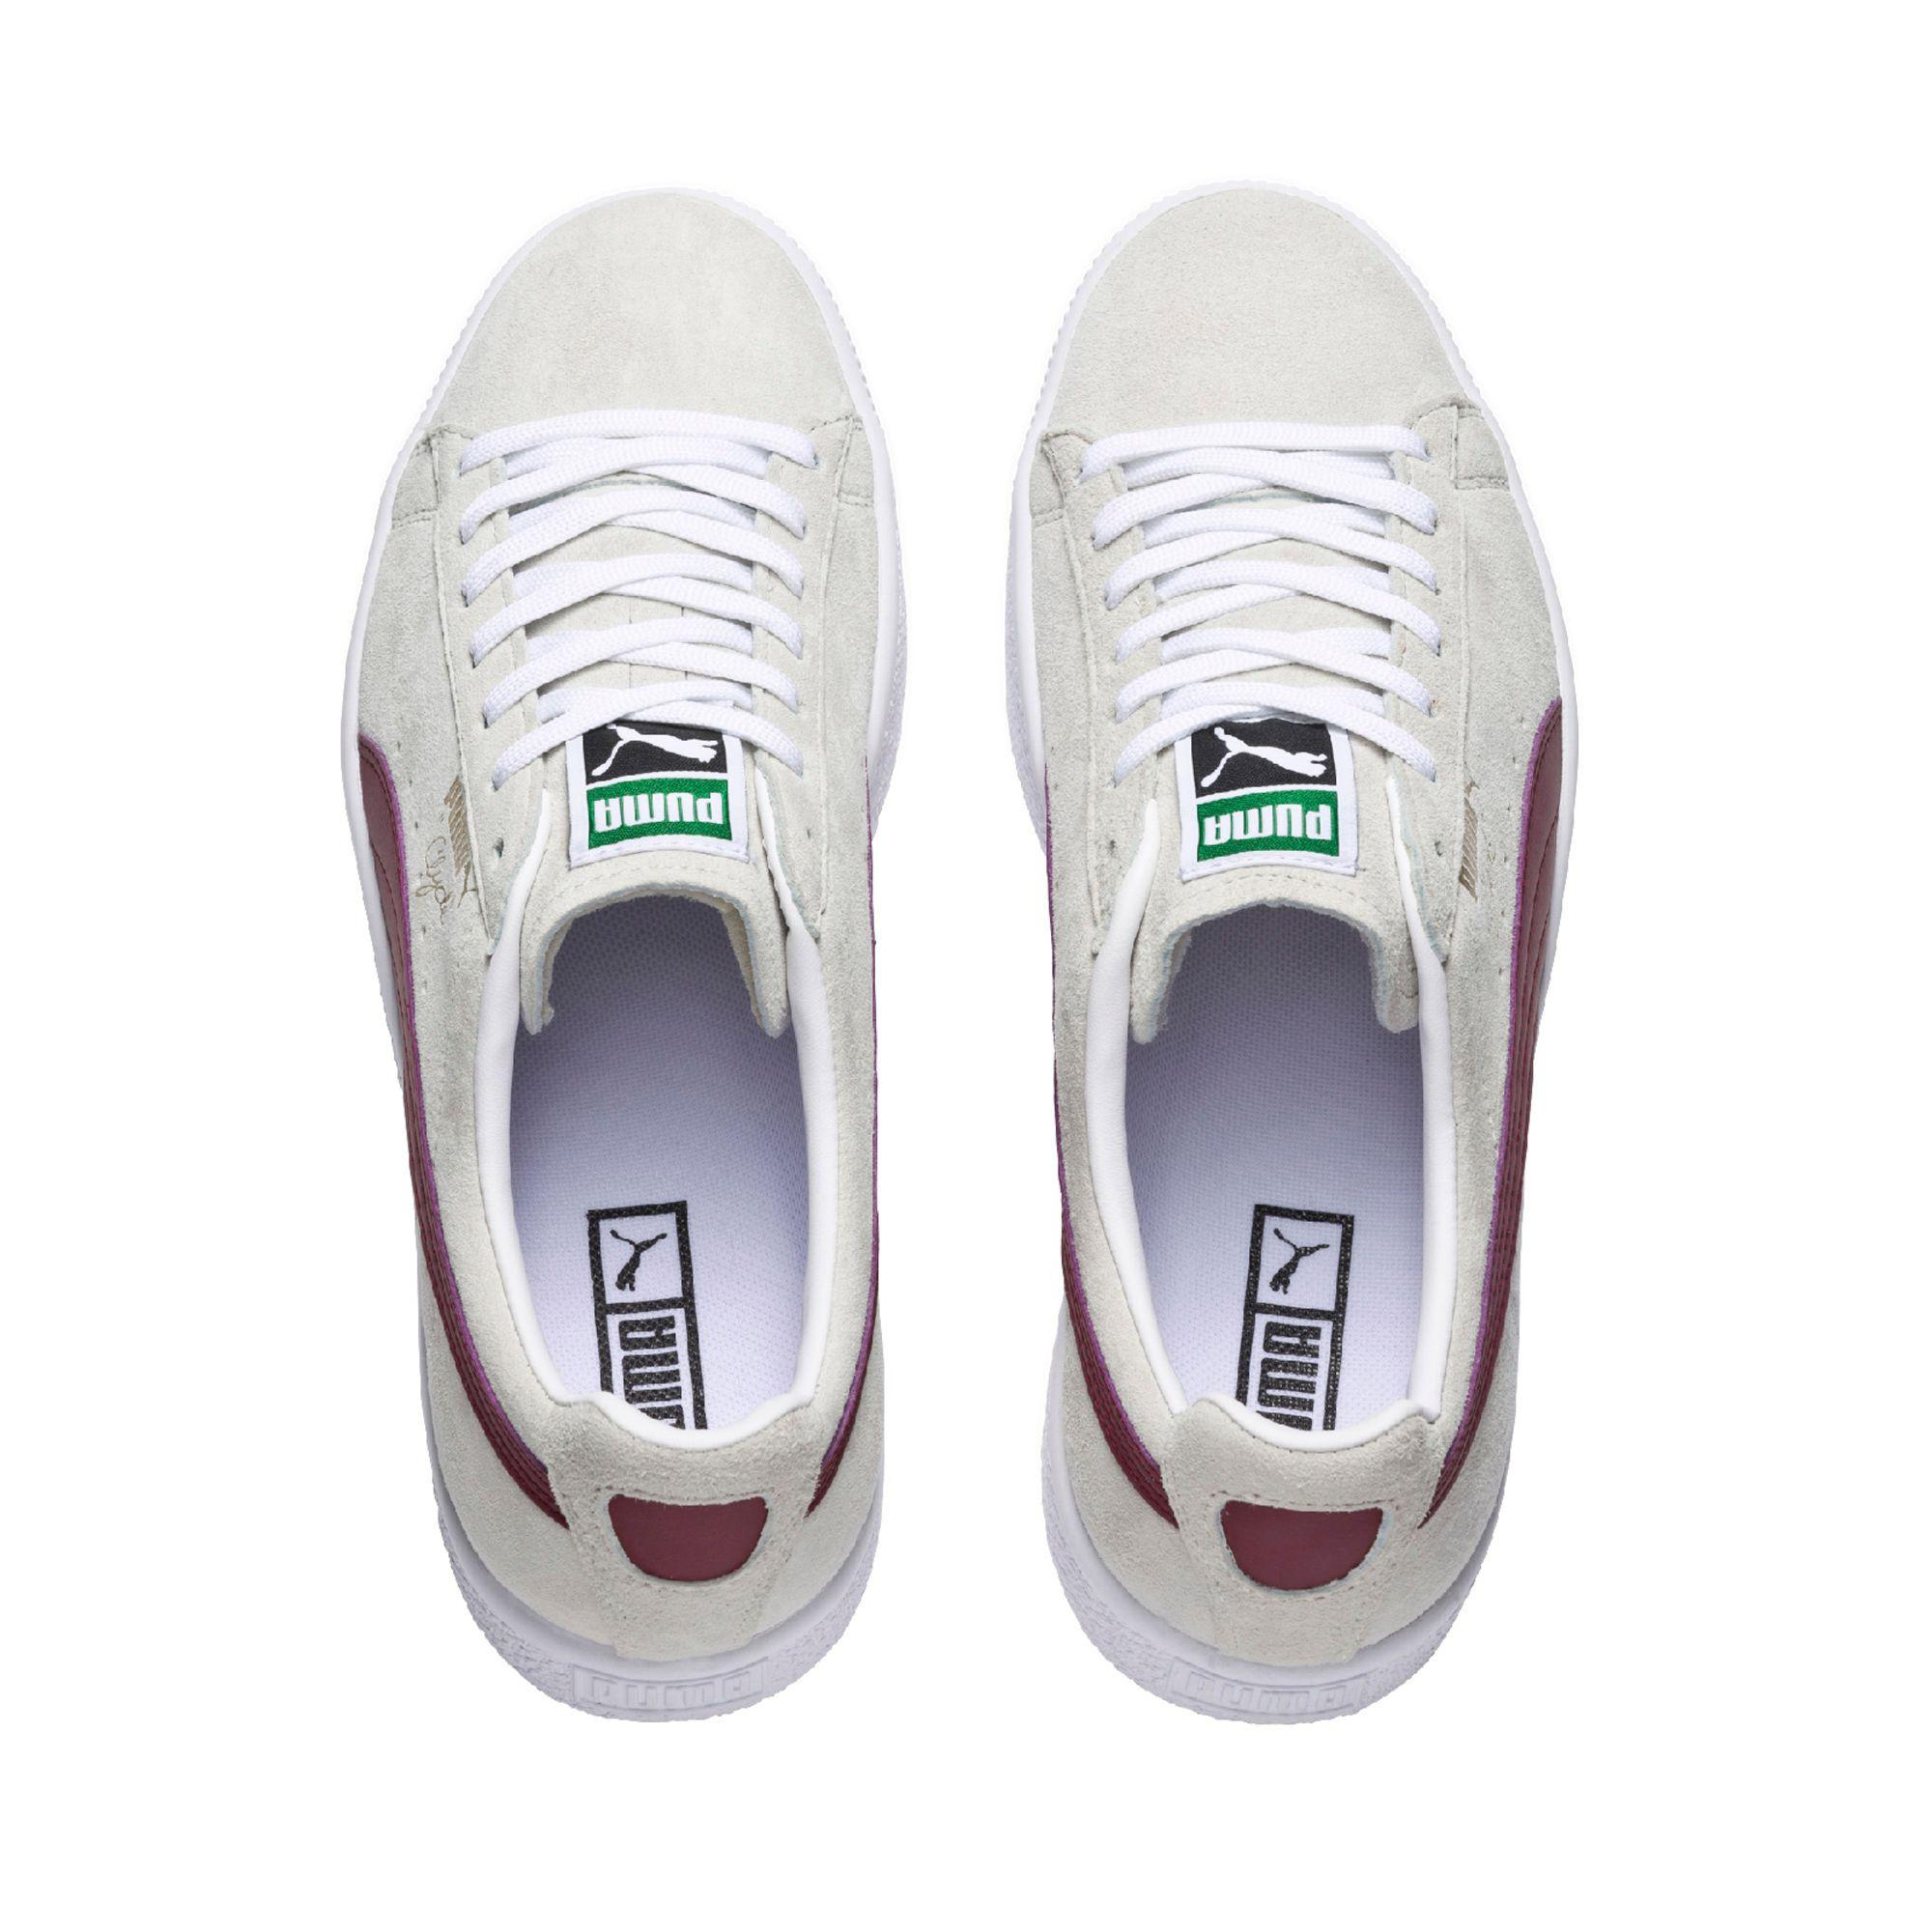 Lyst - Puma Clyde Premium Core Men s Sneakers in White for Men aecb63e0d